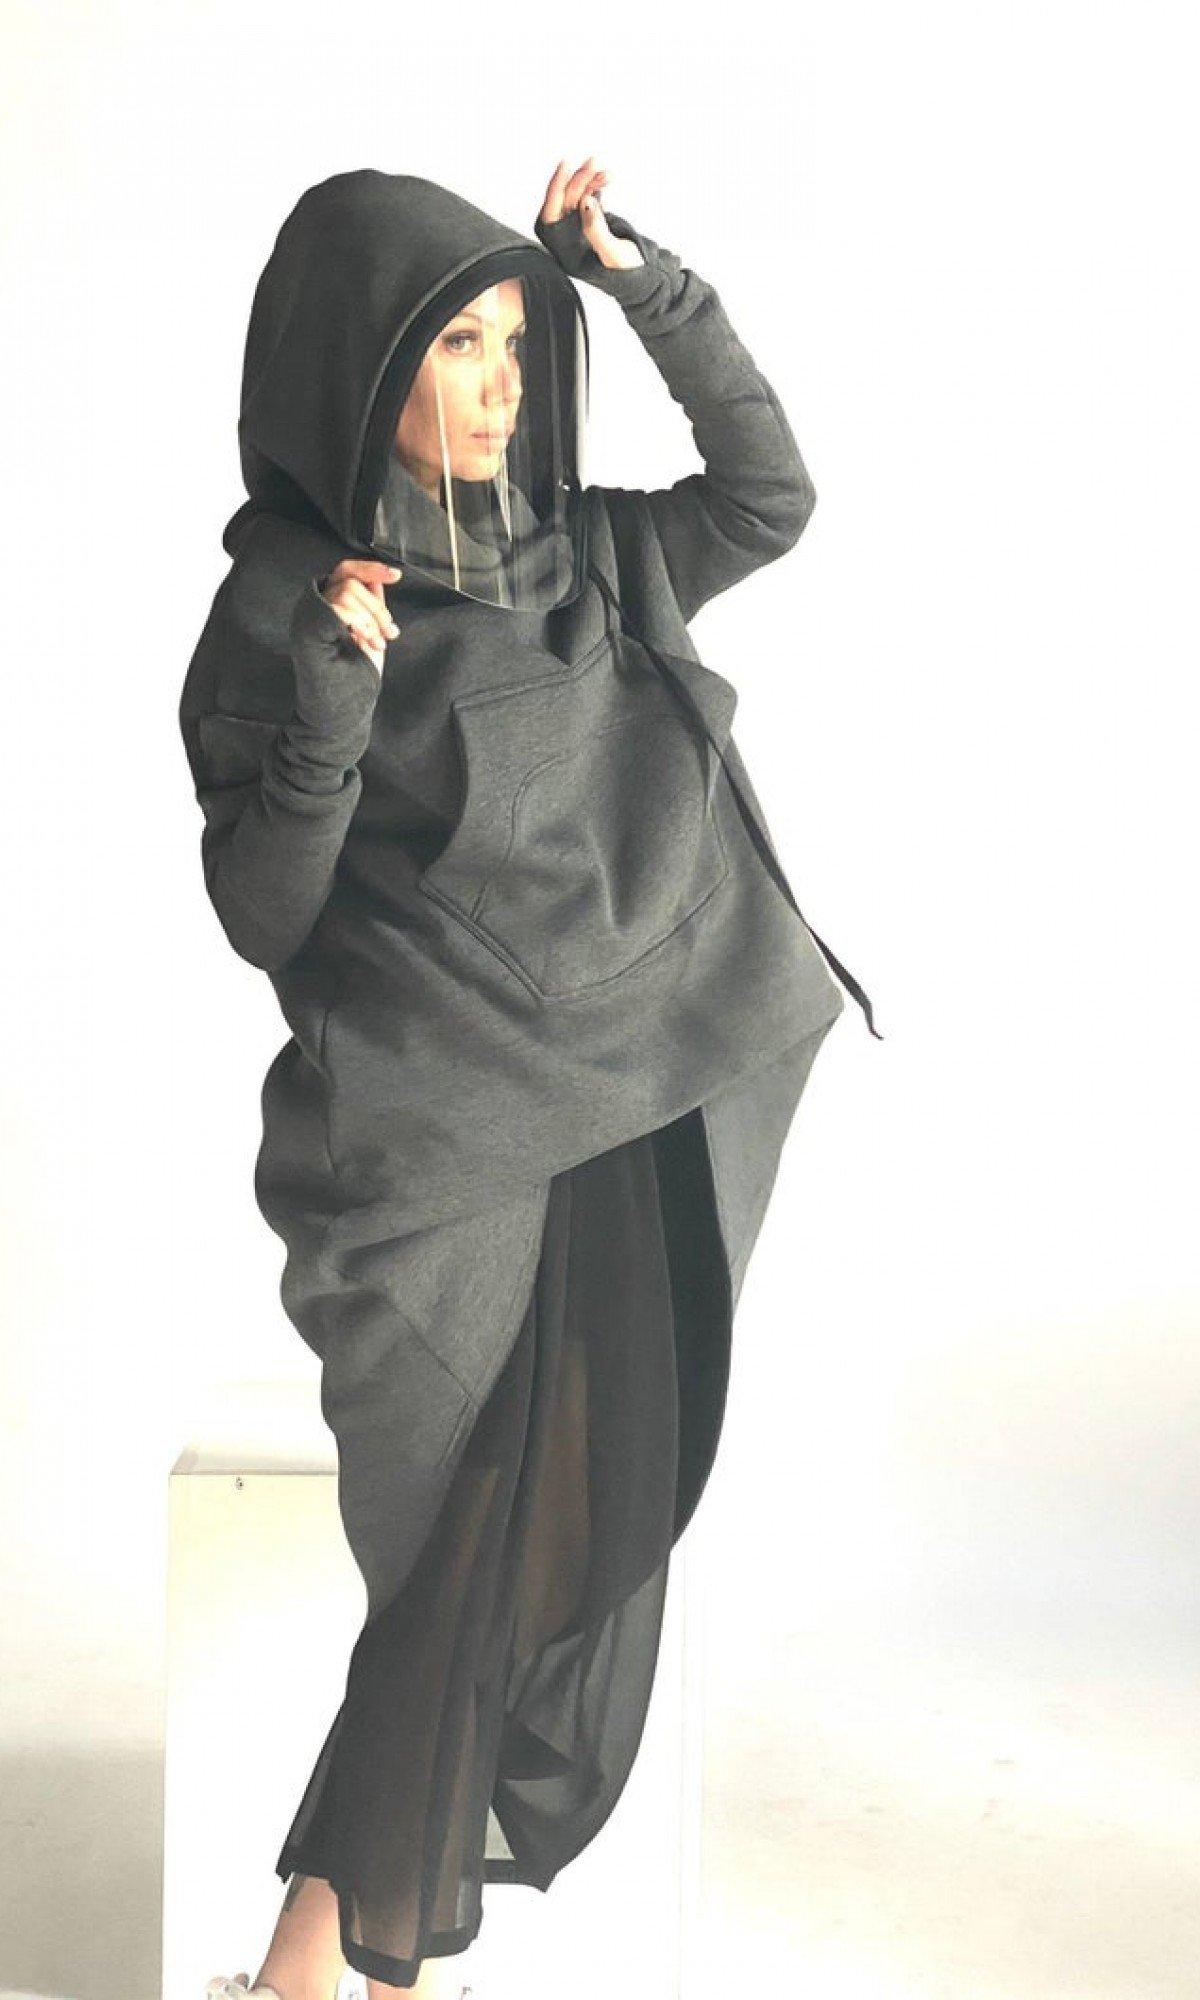 Navy Shield Hoodie Extravarant Maxi Asymmetric Hoodie / Fleece Cotton Warm full face covering Top / zip or unzip it / handmade by Aaksha